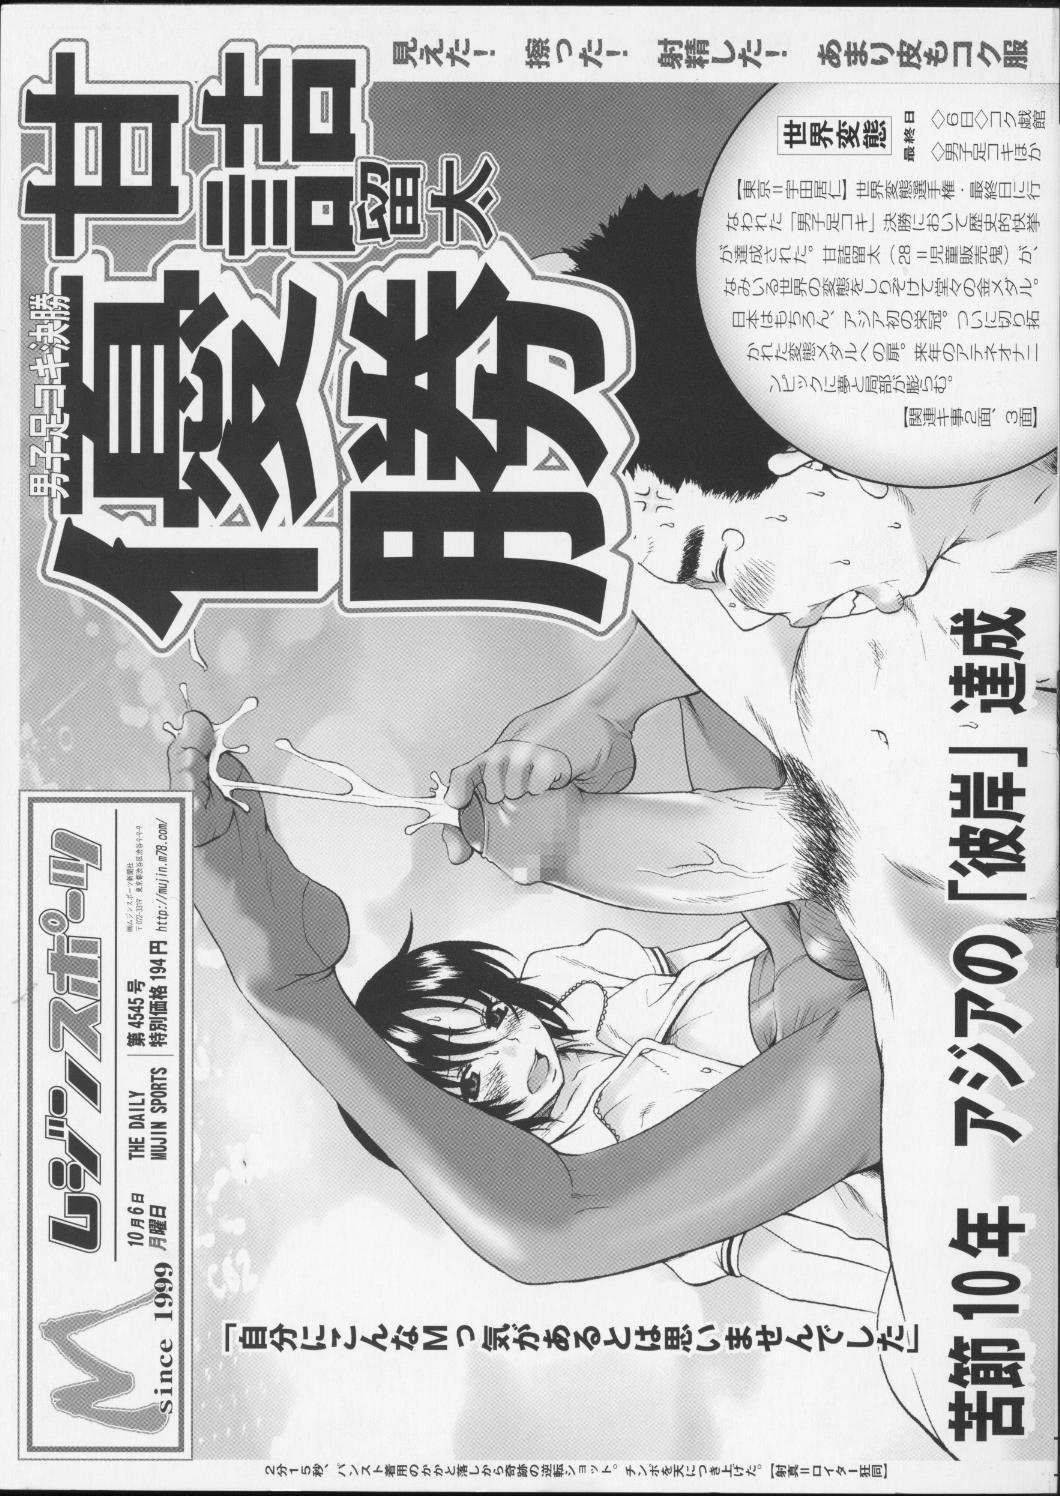 Kimi no Na o Yobeba - If I call your name. 4